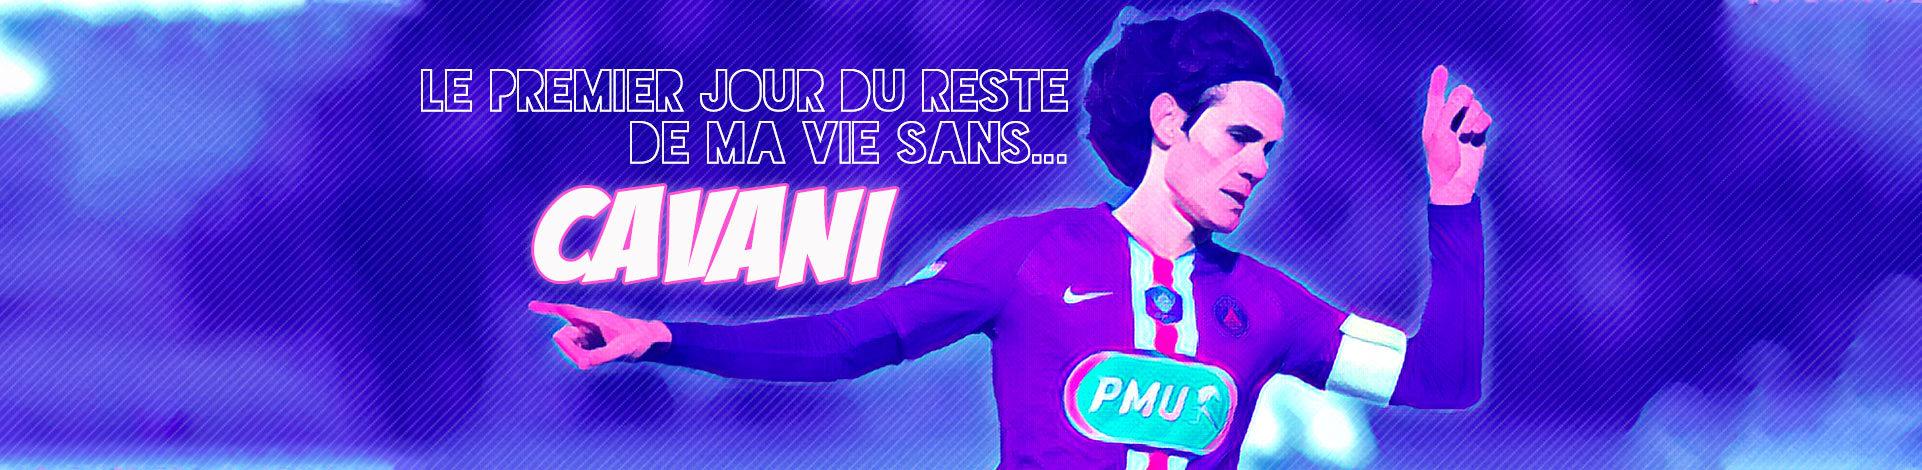 Edi Cavani Virage PSG